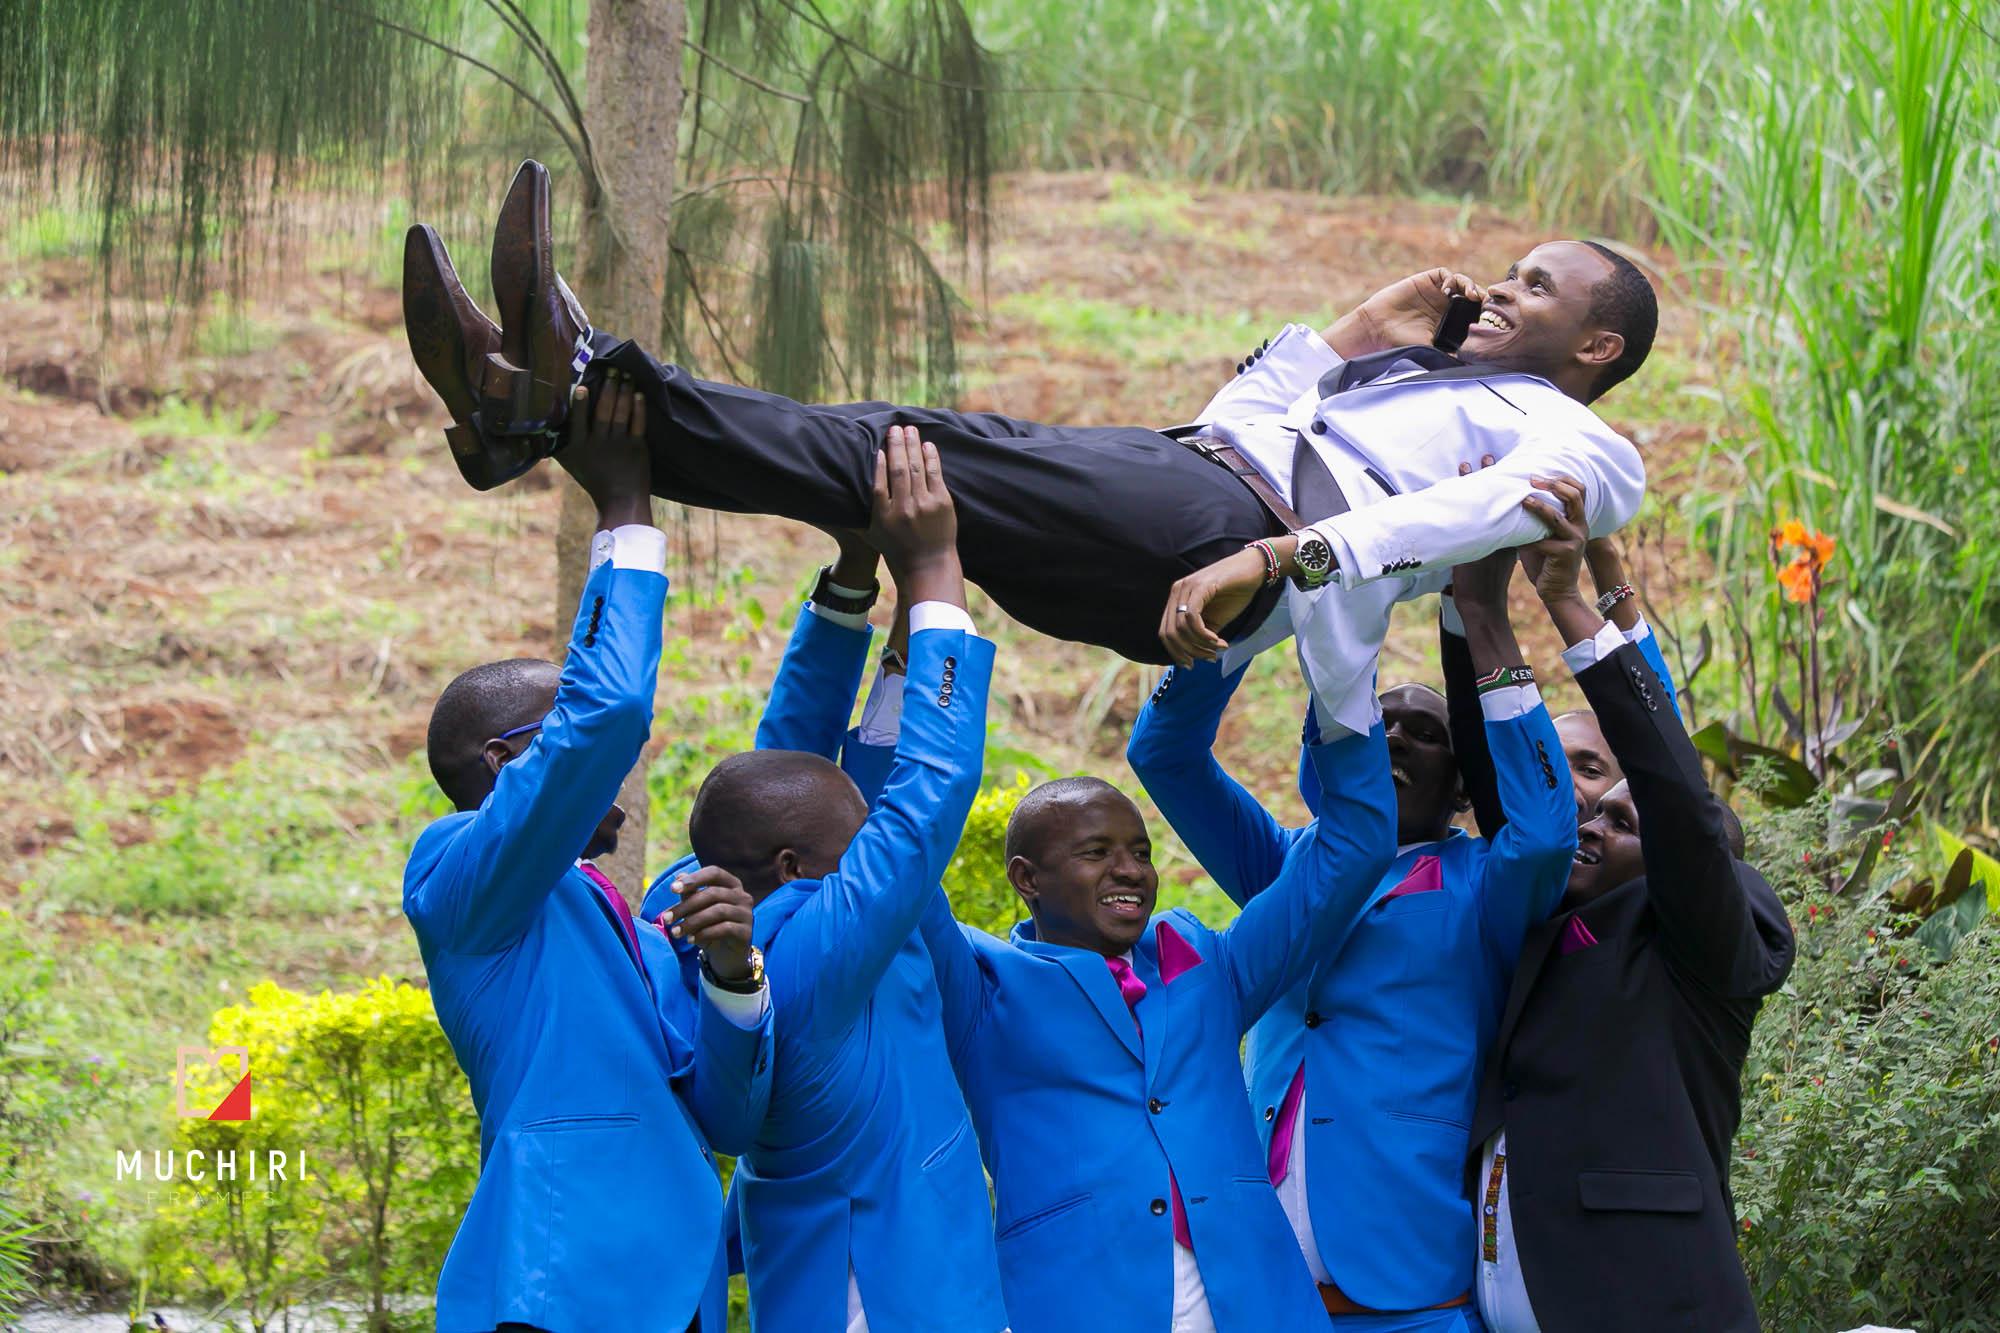 Top photographers in Kenya